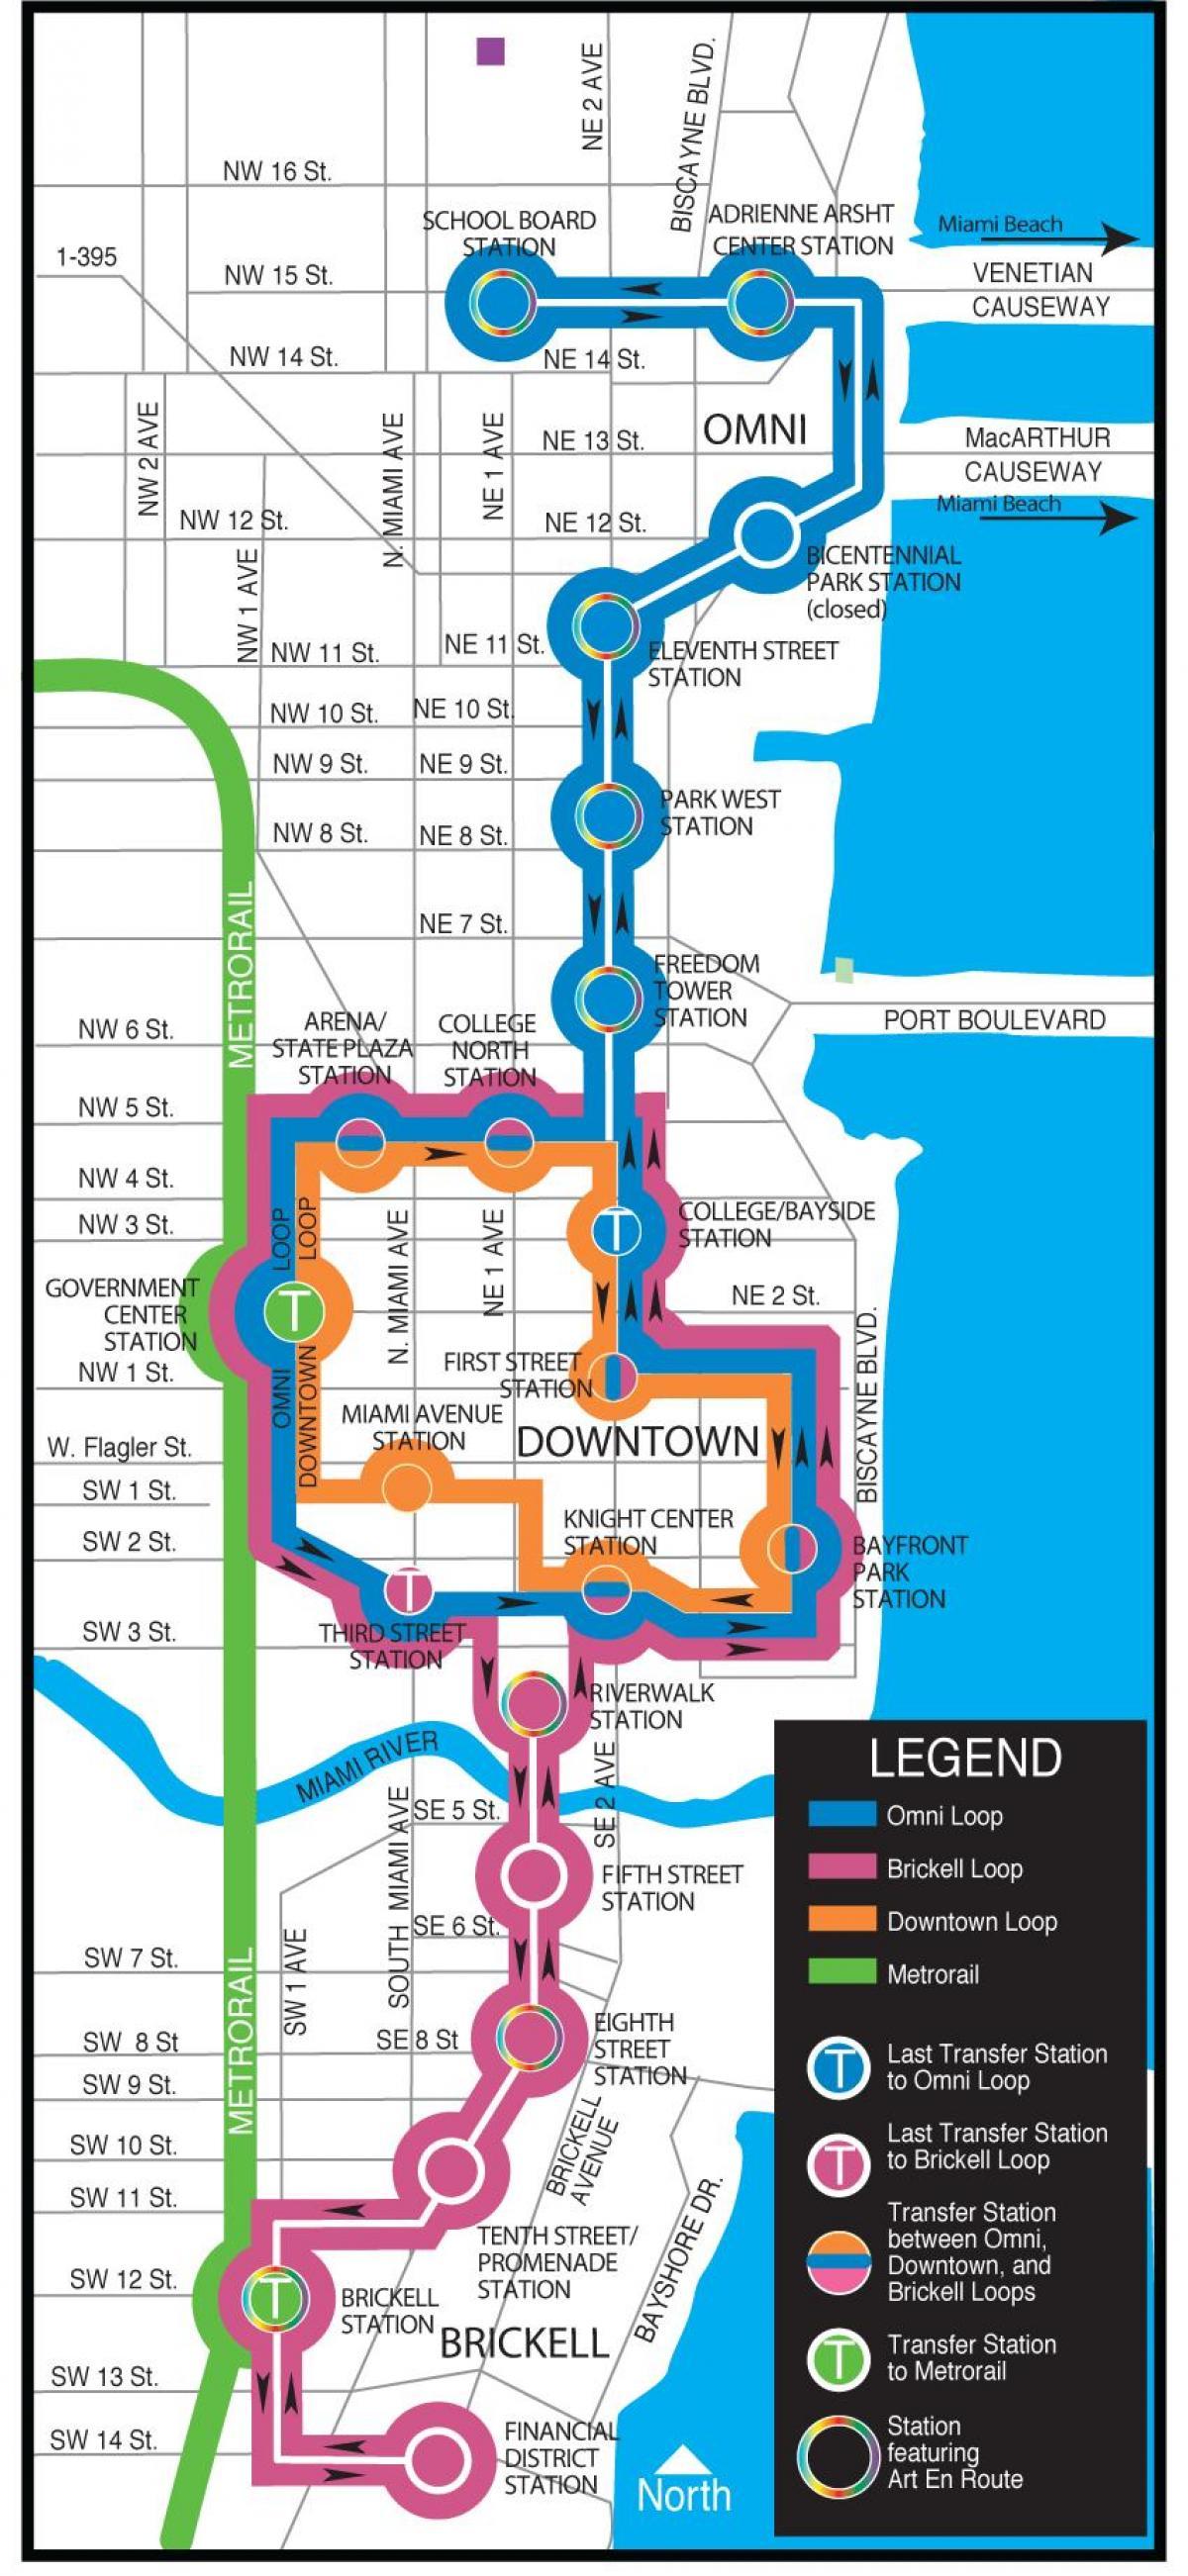 miami metromover mapa - metromover mapa de miami (florida